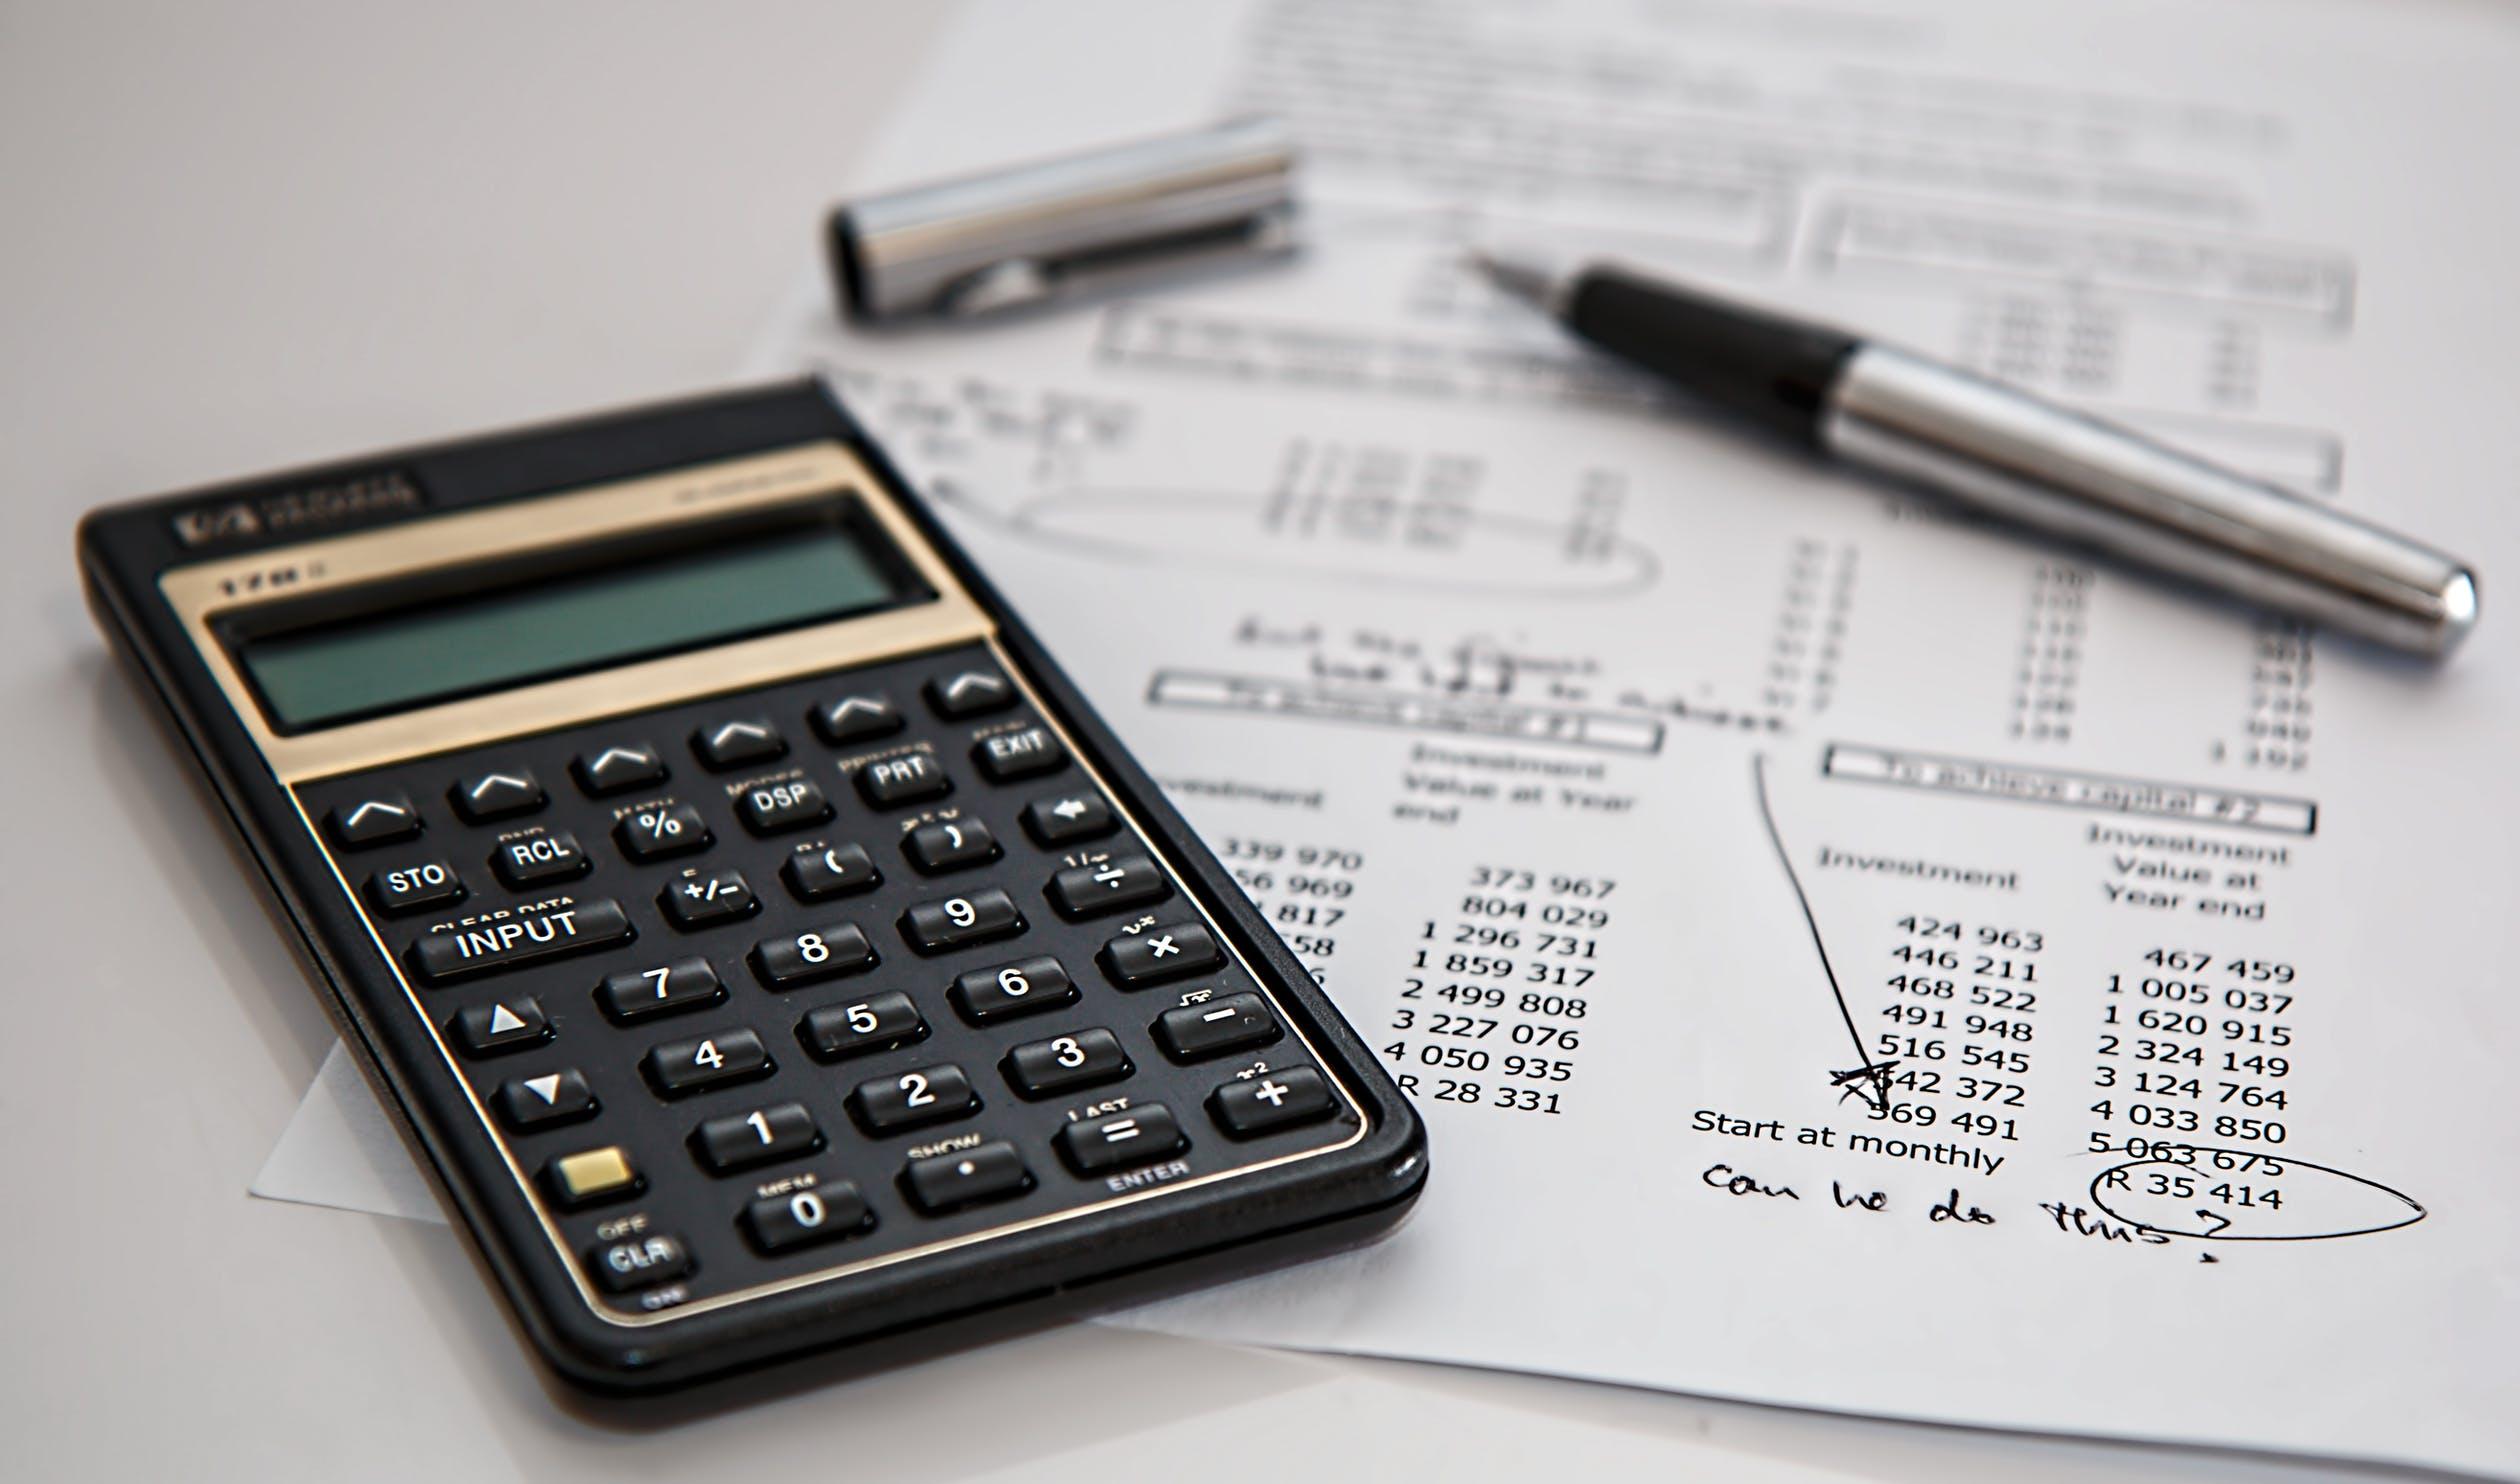 auditor working on an internal financial audit